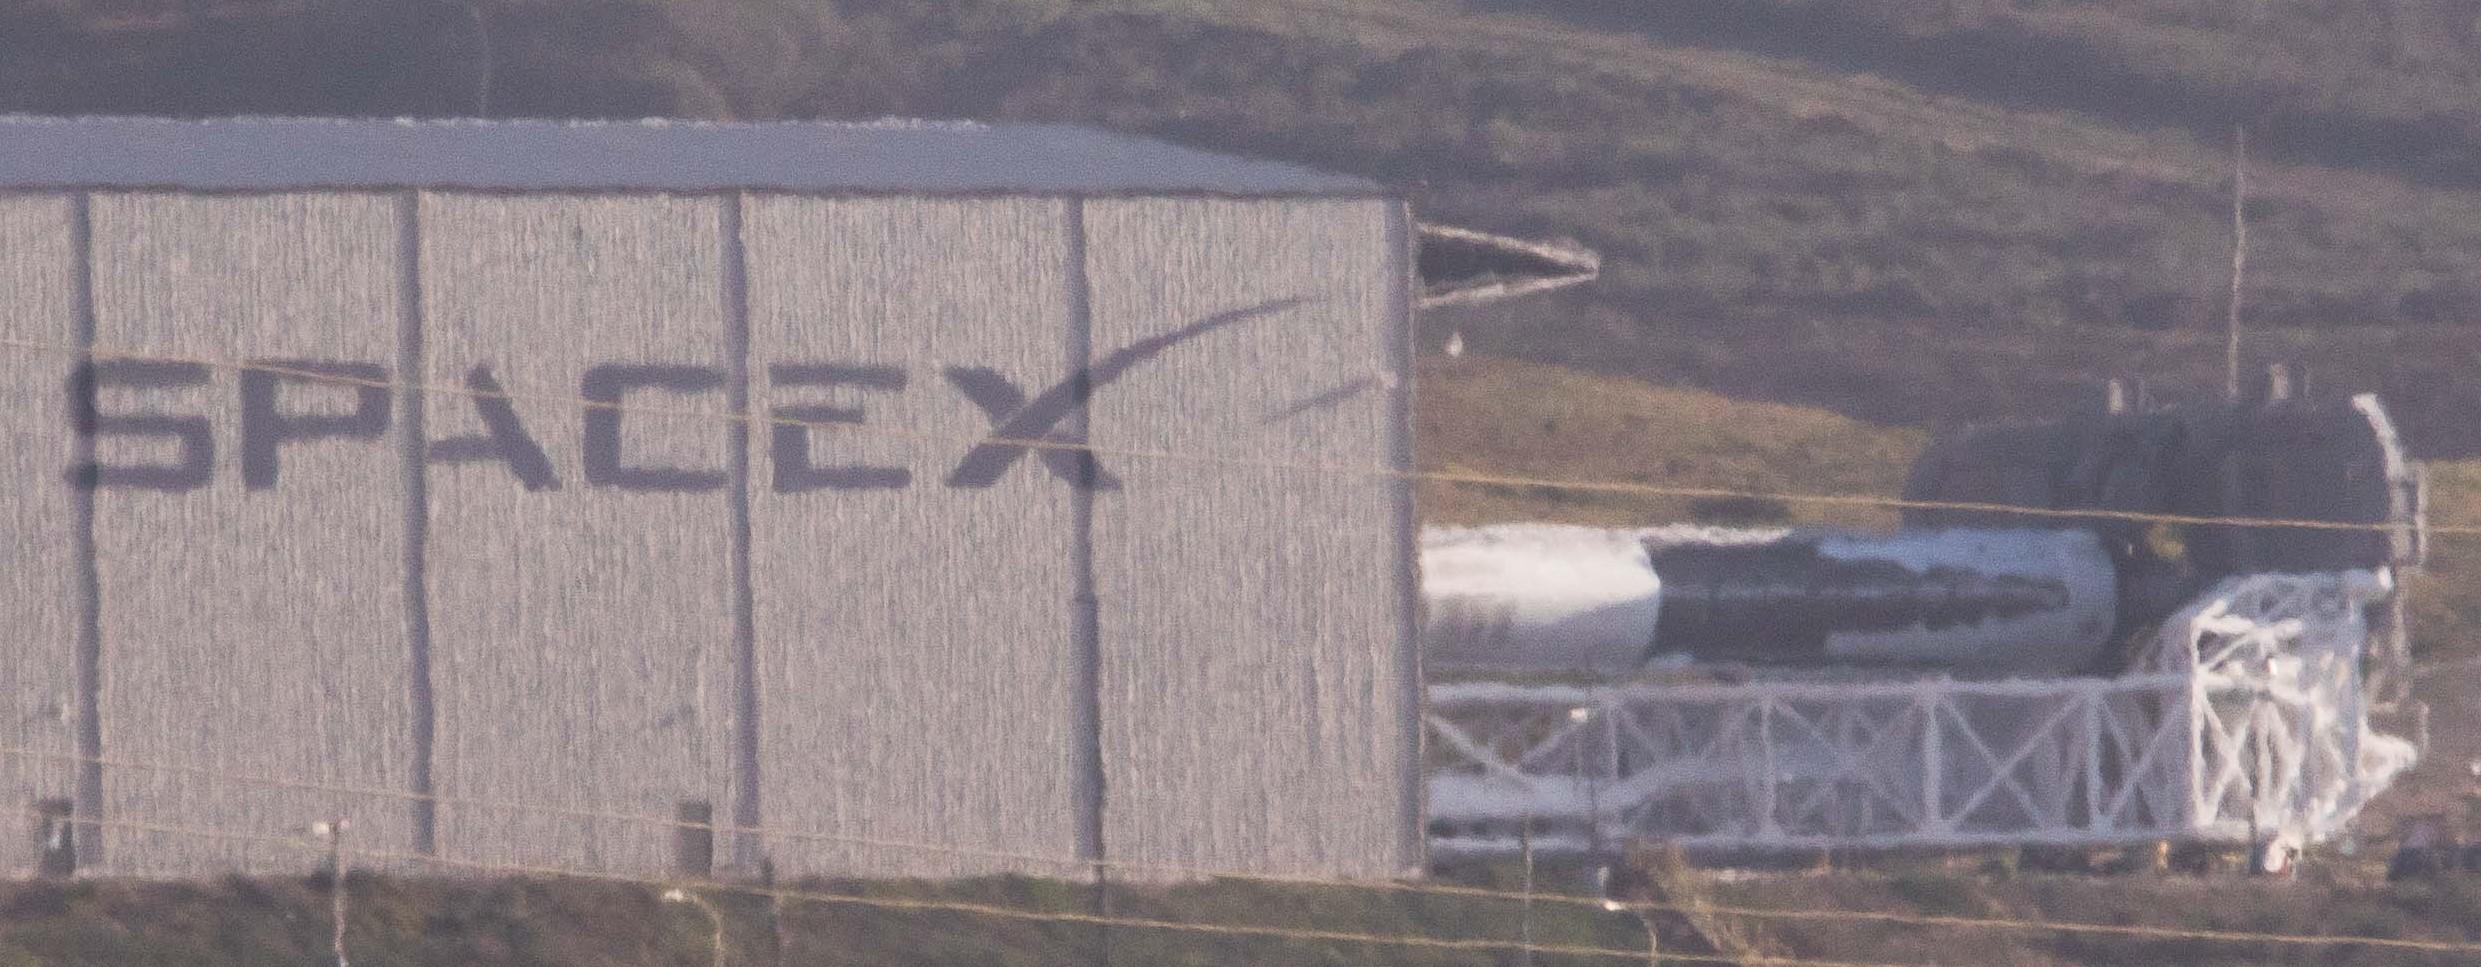 Falcon 9 1038 rollout crop 021718 (Pauline Acalin)